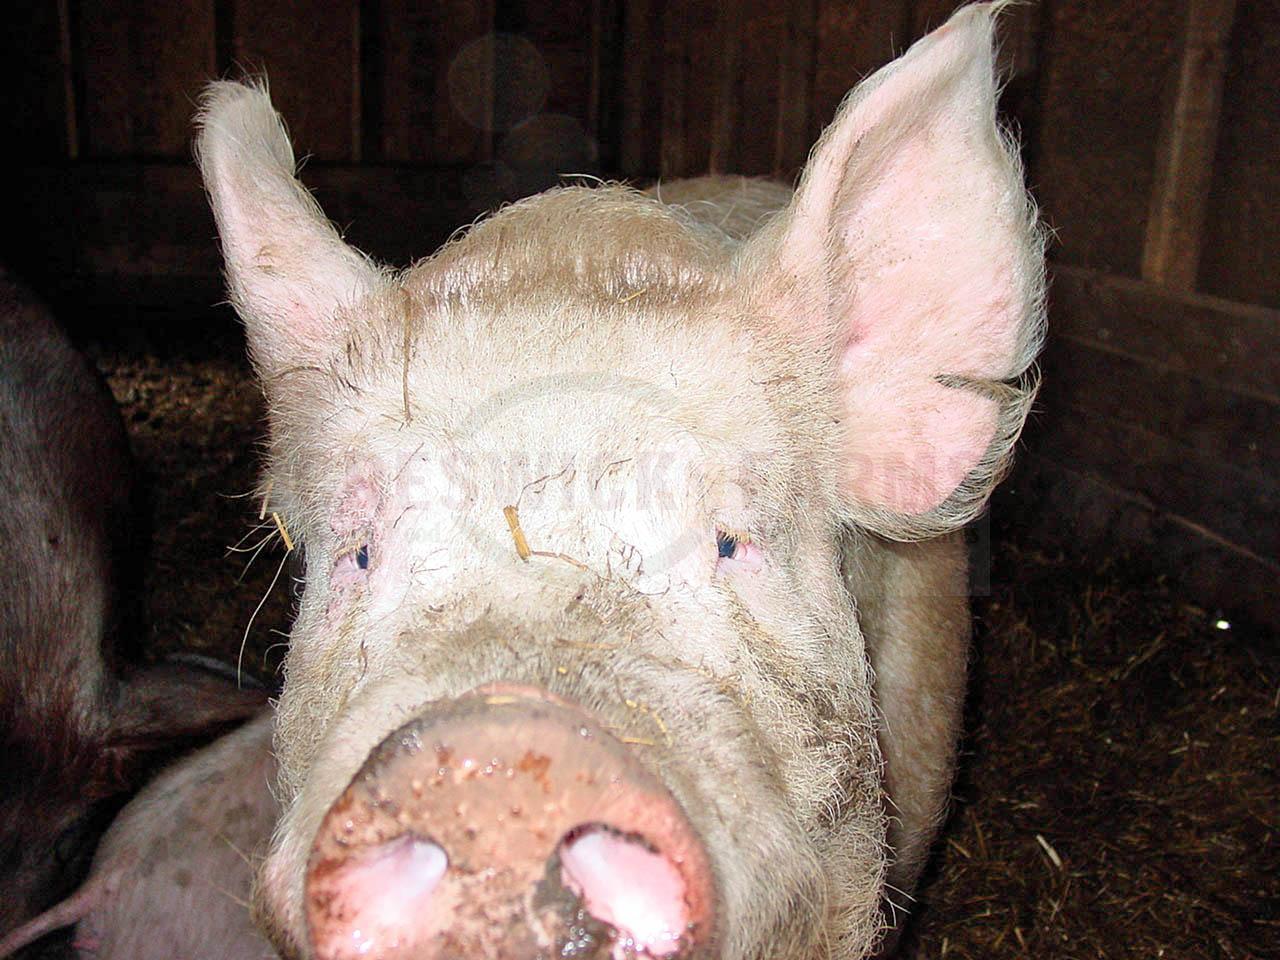 Pig 02022012 a.jpg